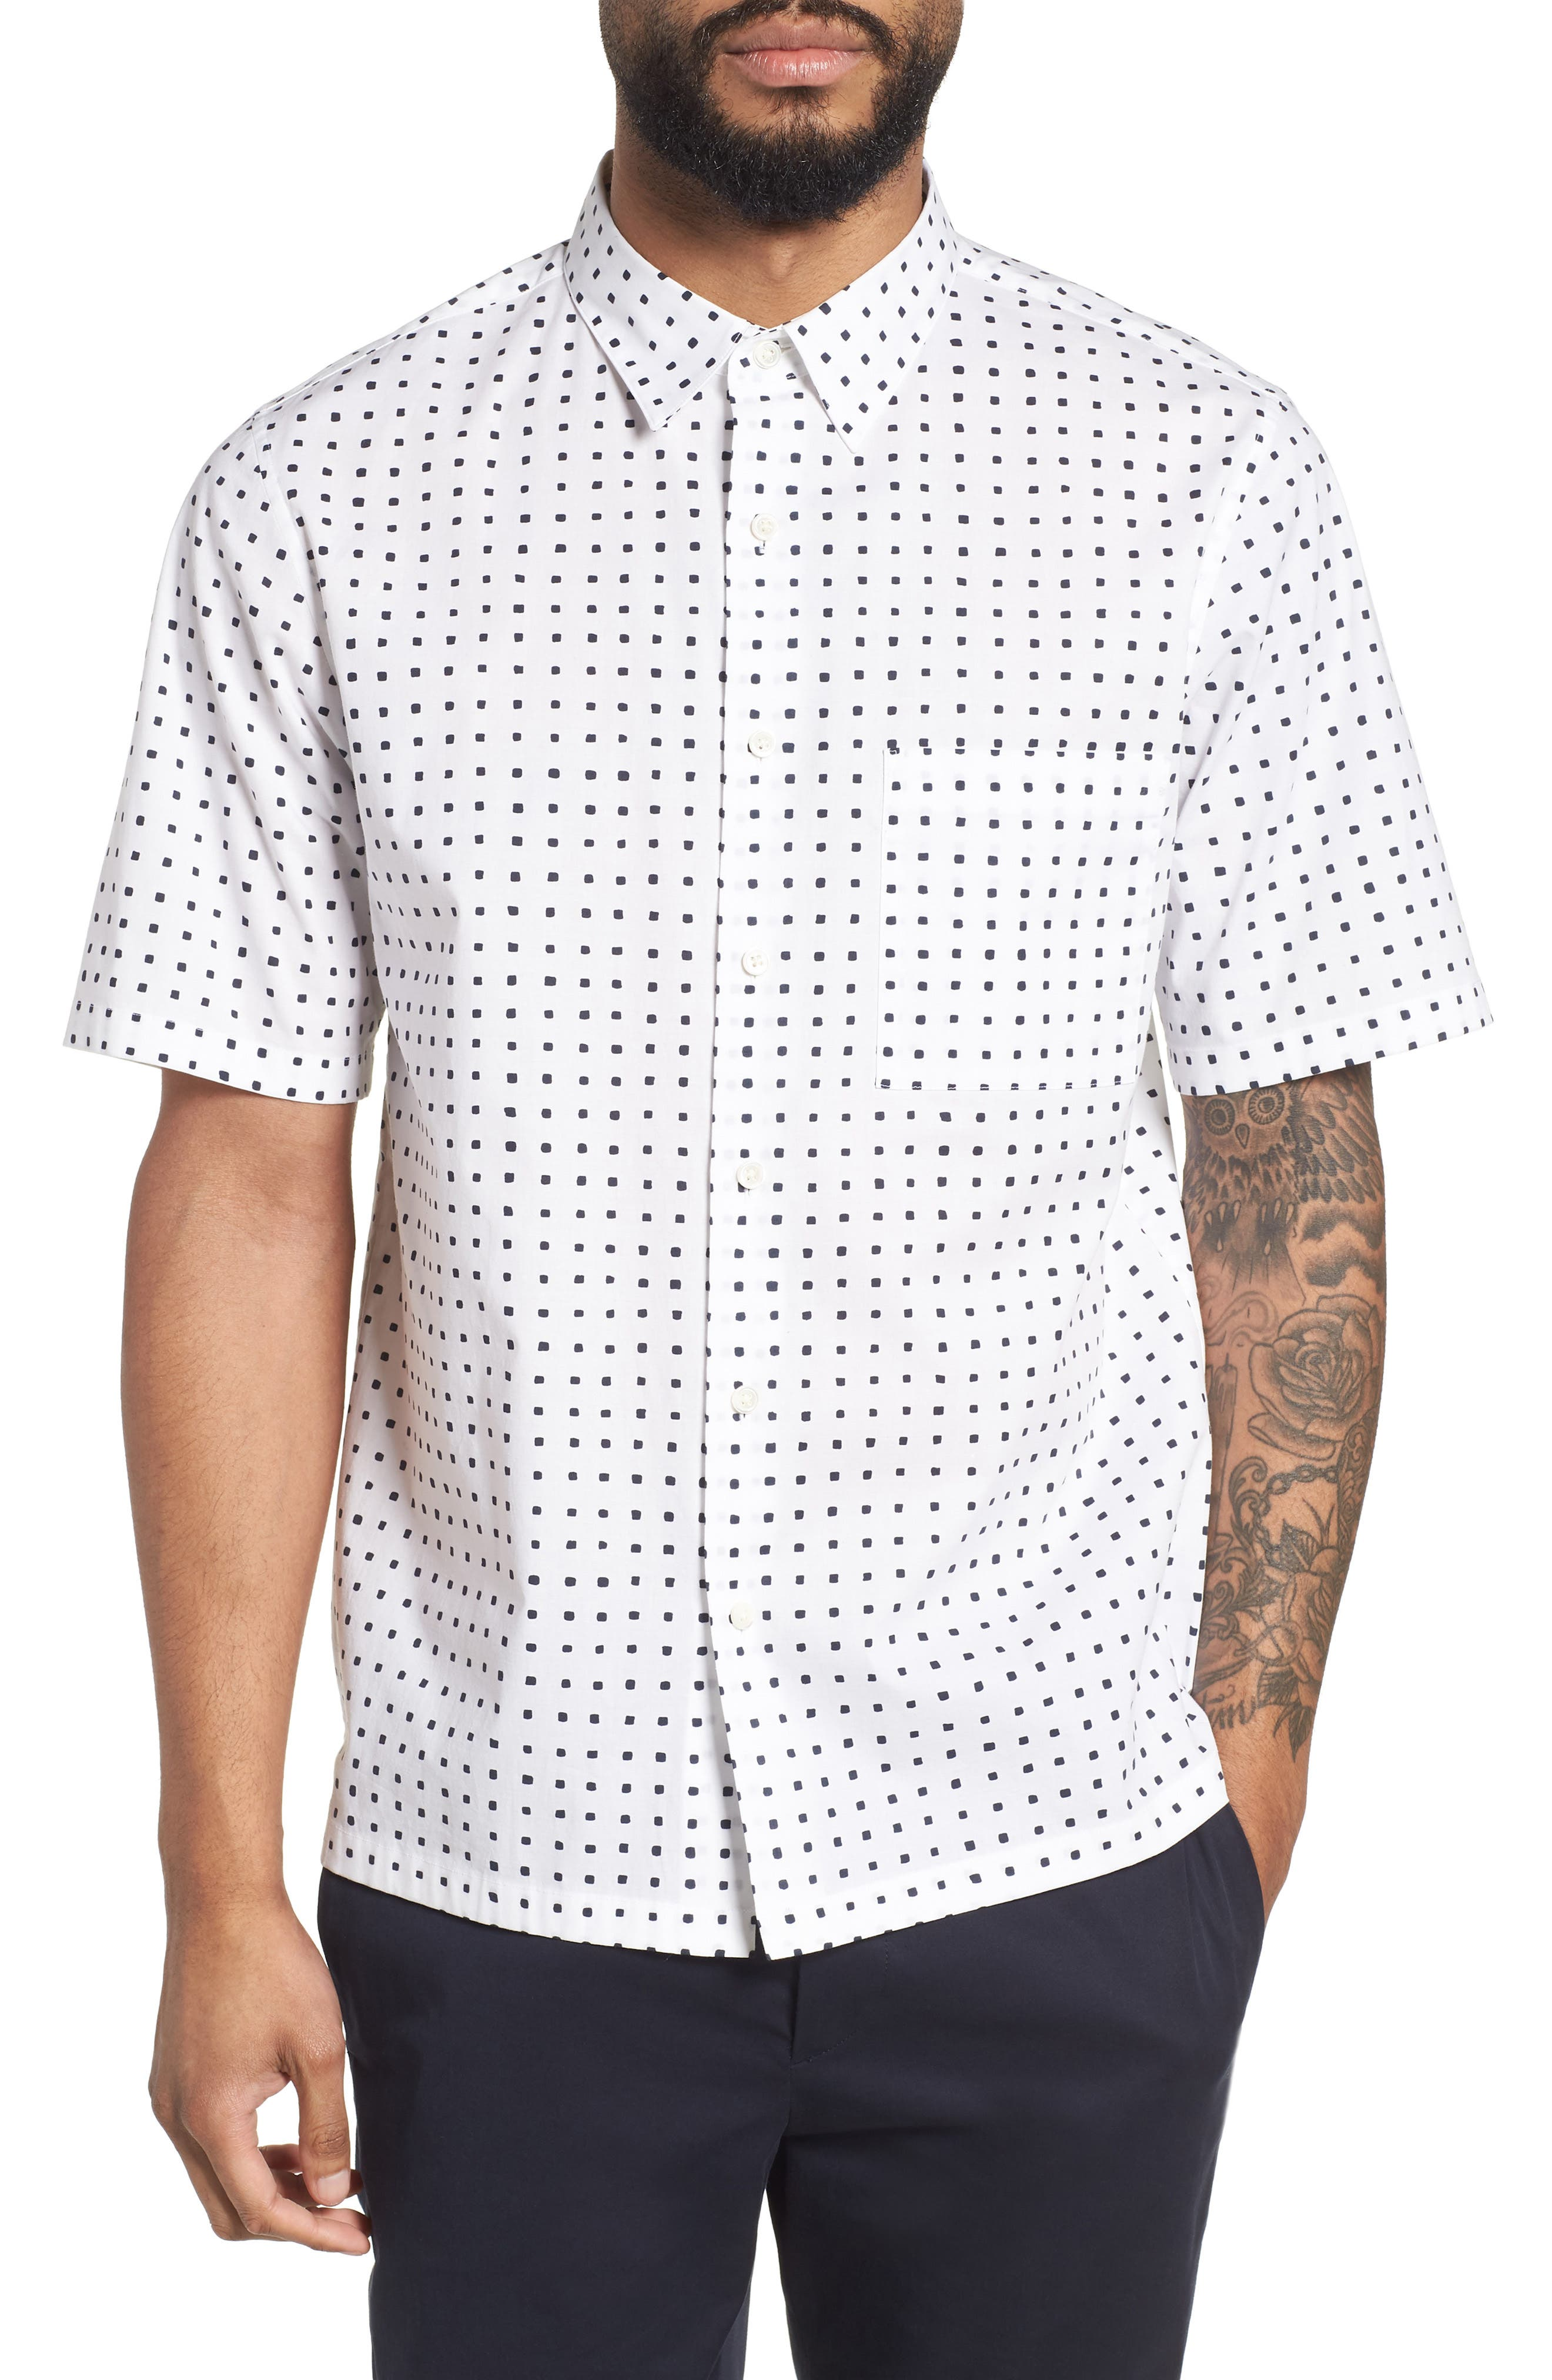 Bruner Trim Fit Dot Short Sleeve Sport Shirt,                             Main thumbnail 1, color,                             110